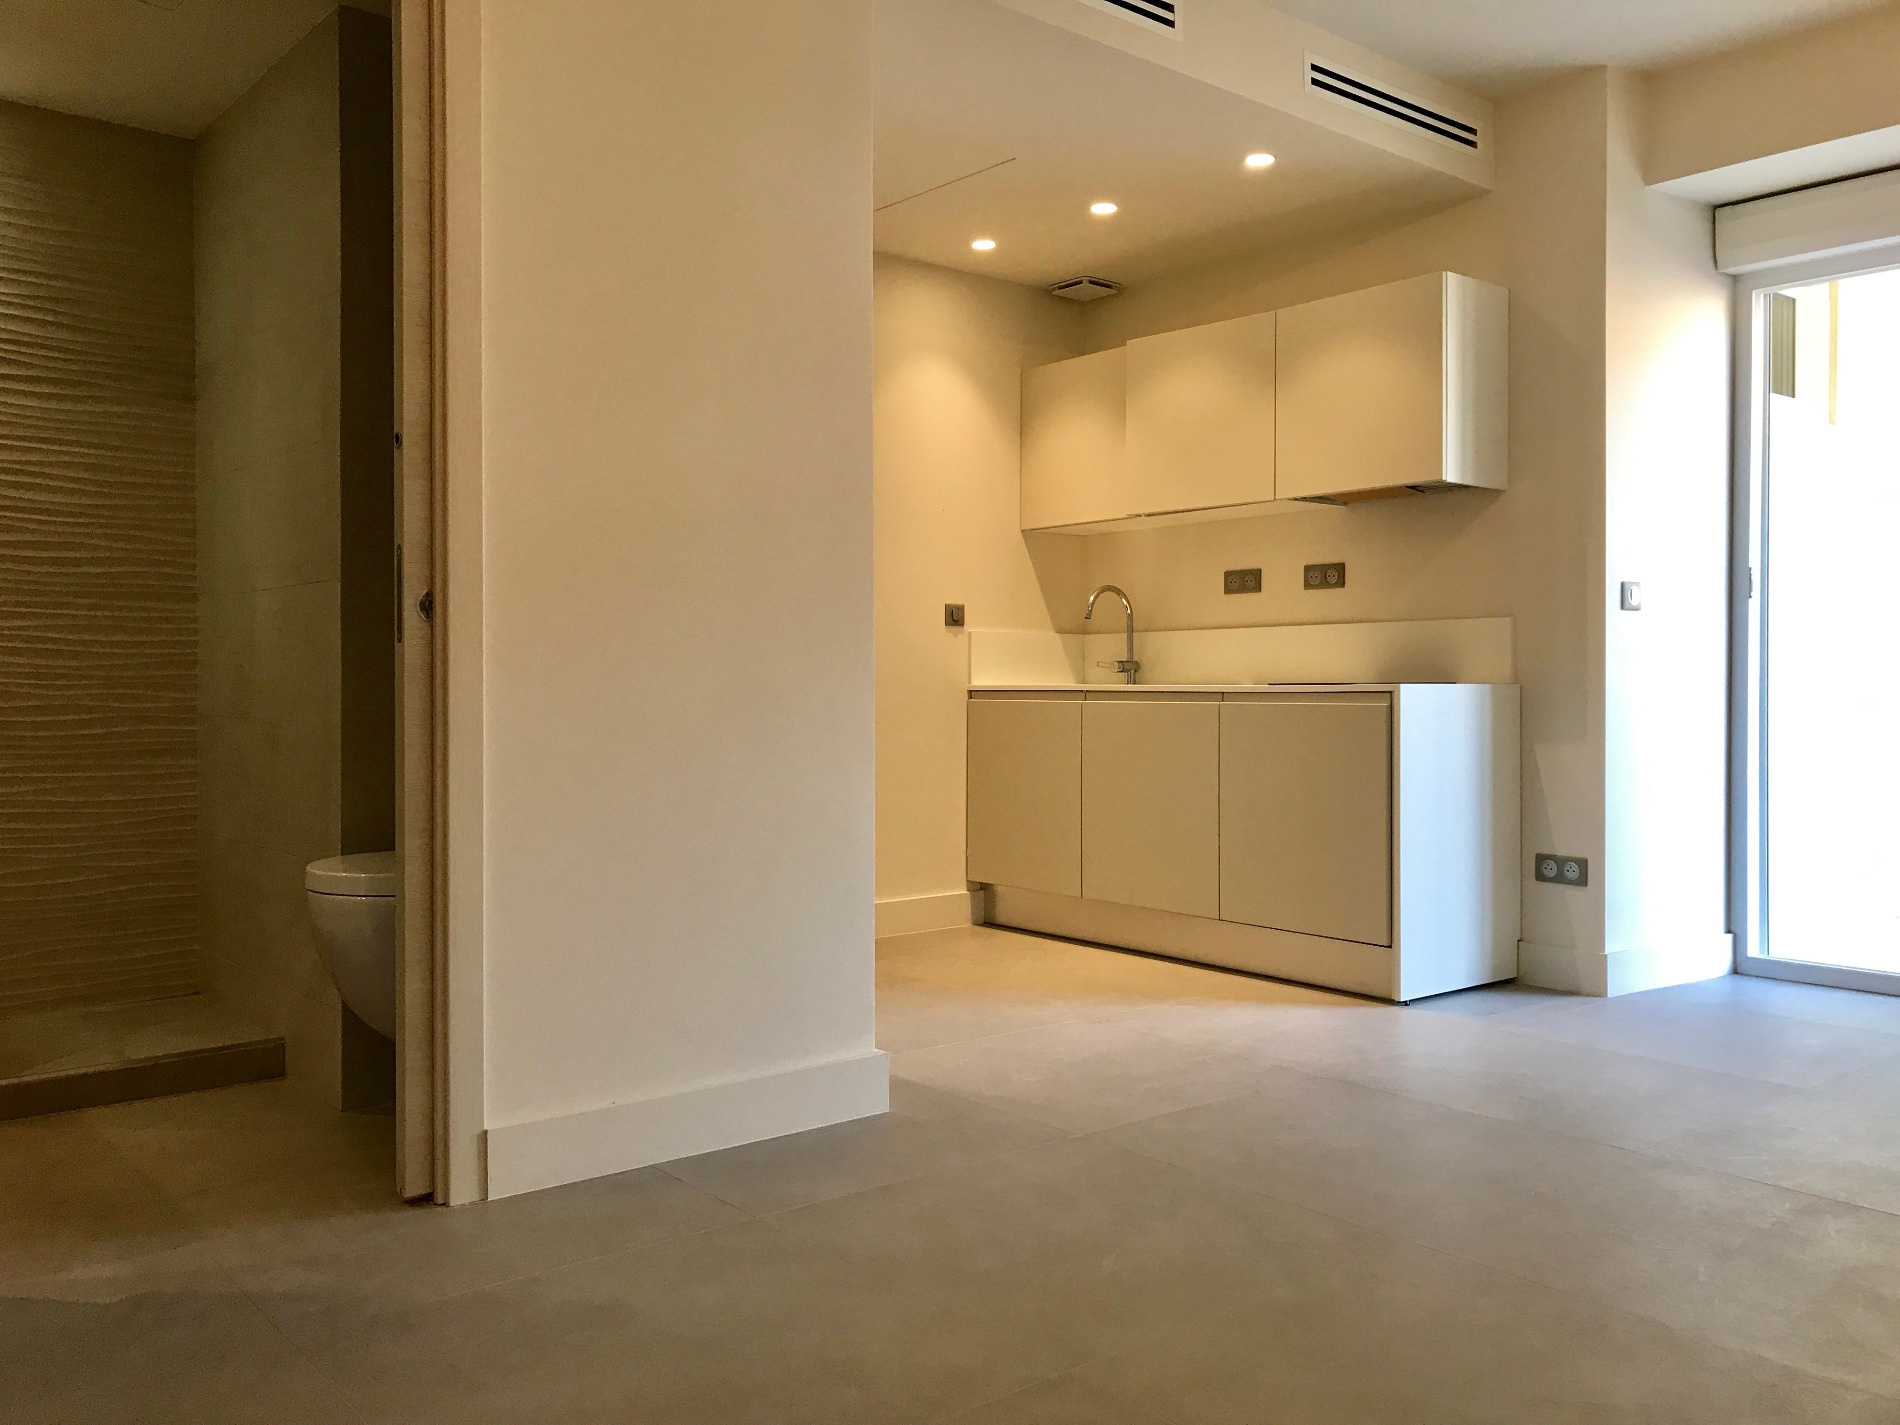 vente superbe studio avec coin nuit dans immeuble r habilit avec terrasse. Black Bedroom Furniture Sets. Home Design Ideas